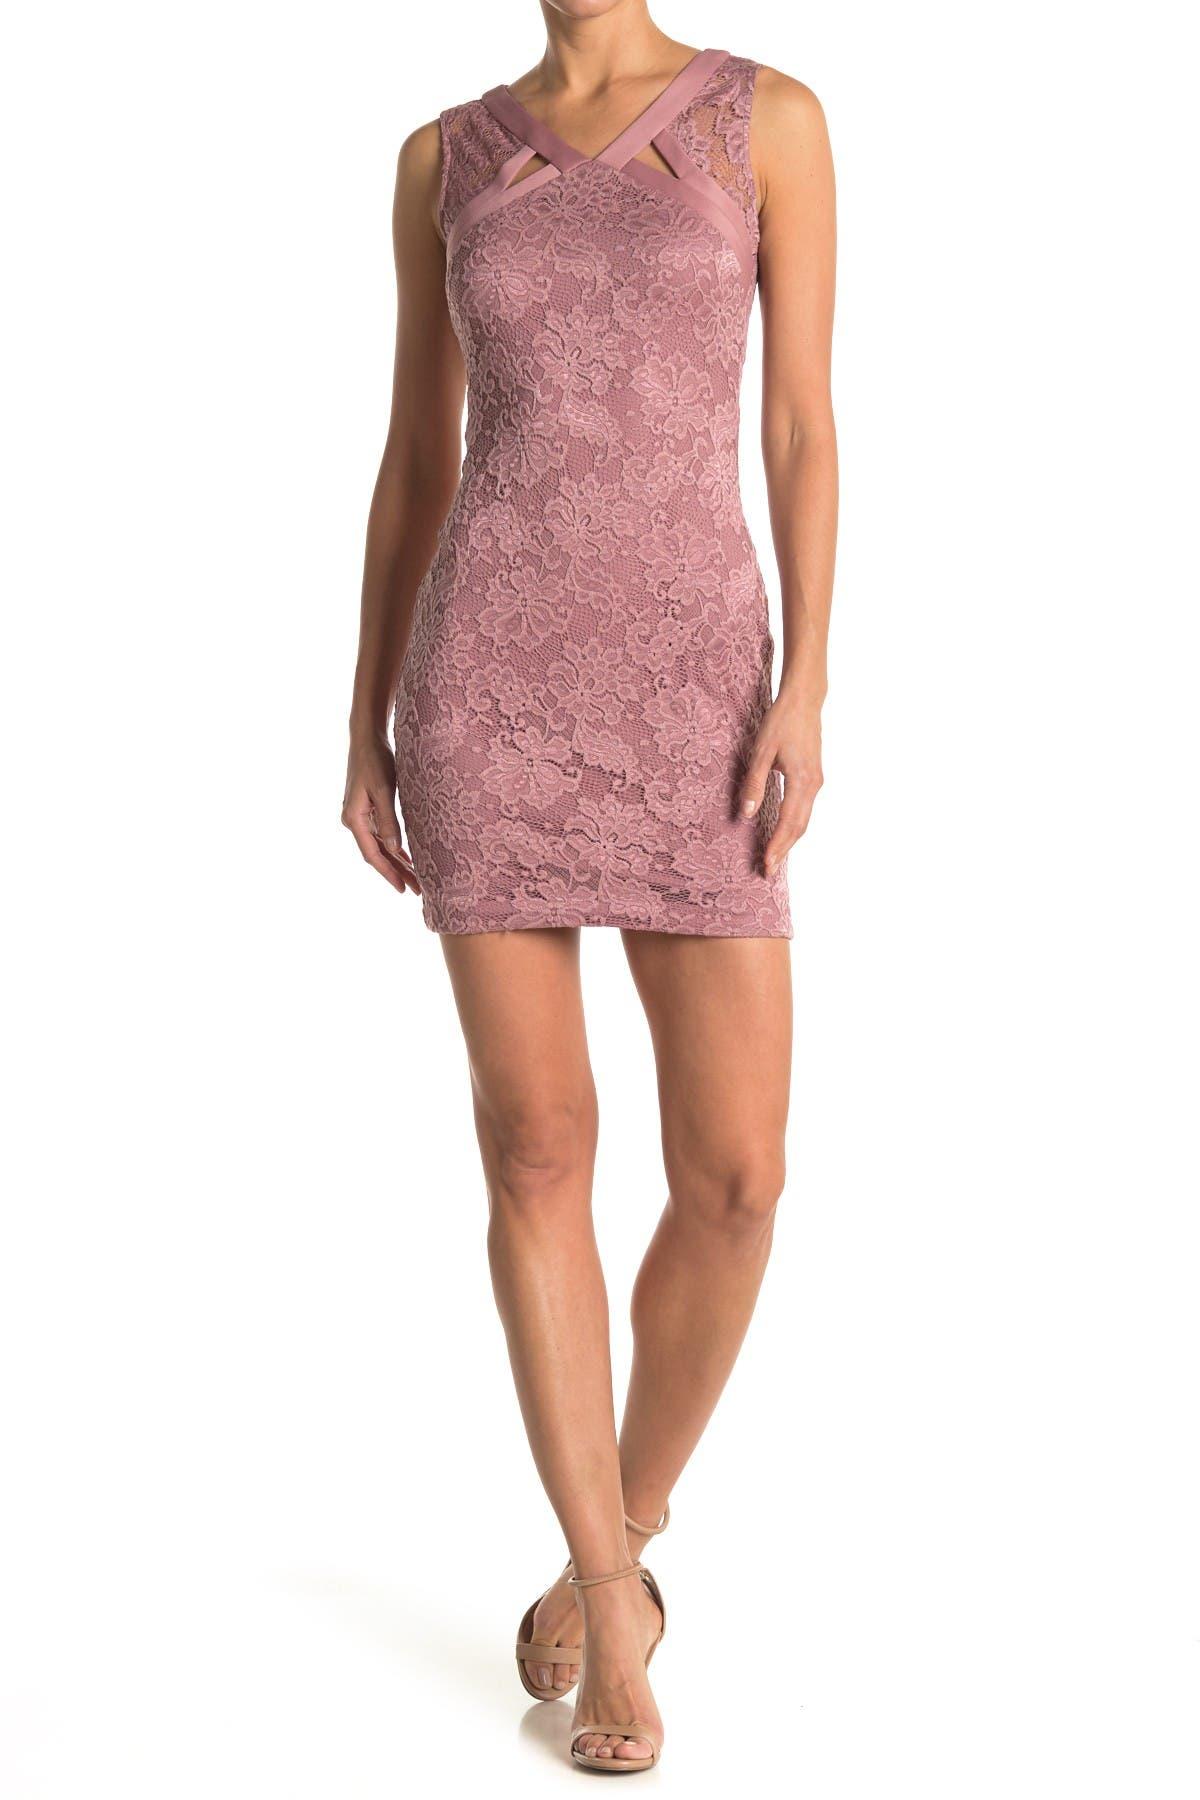 Image of GUESS V-Neck Lace Sheath Dress